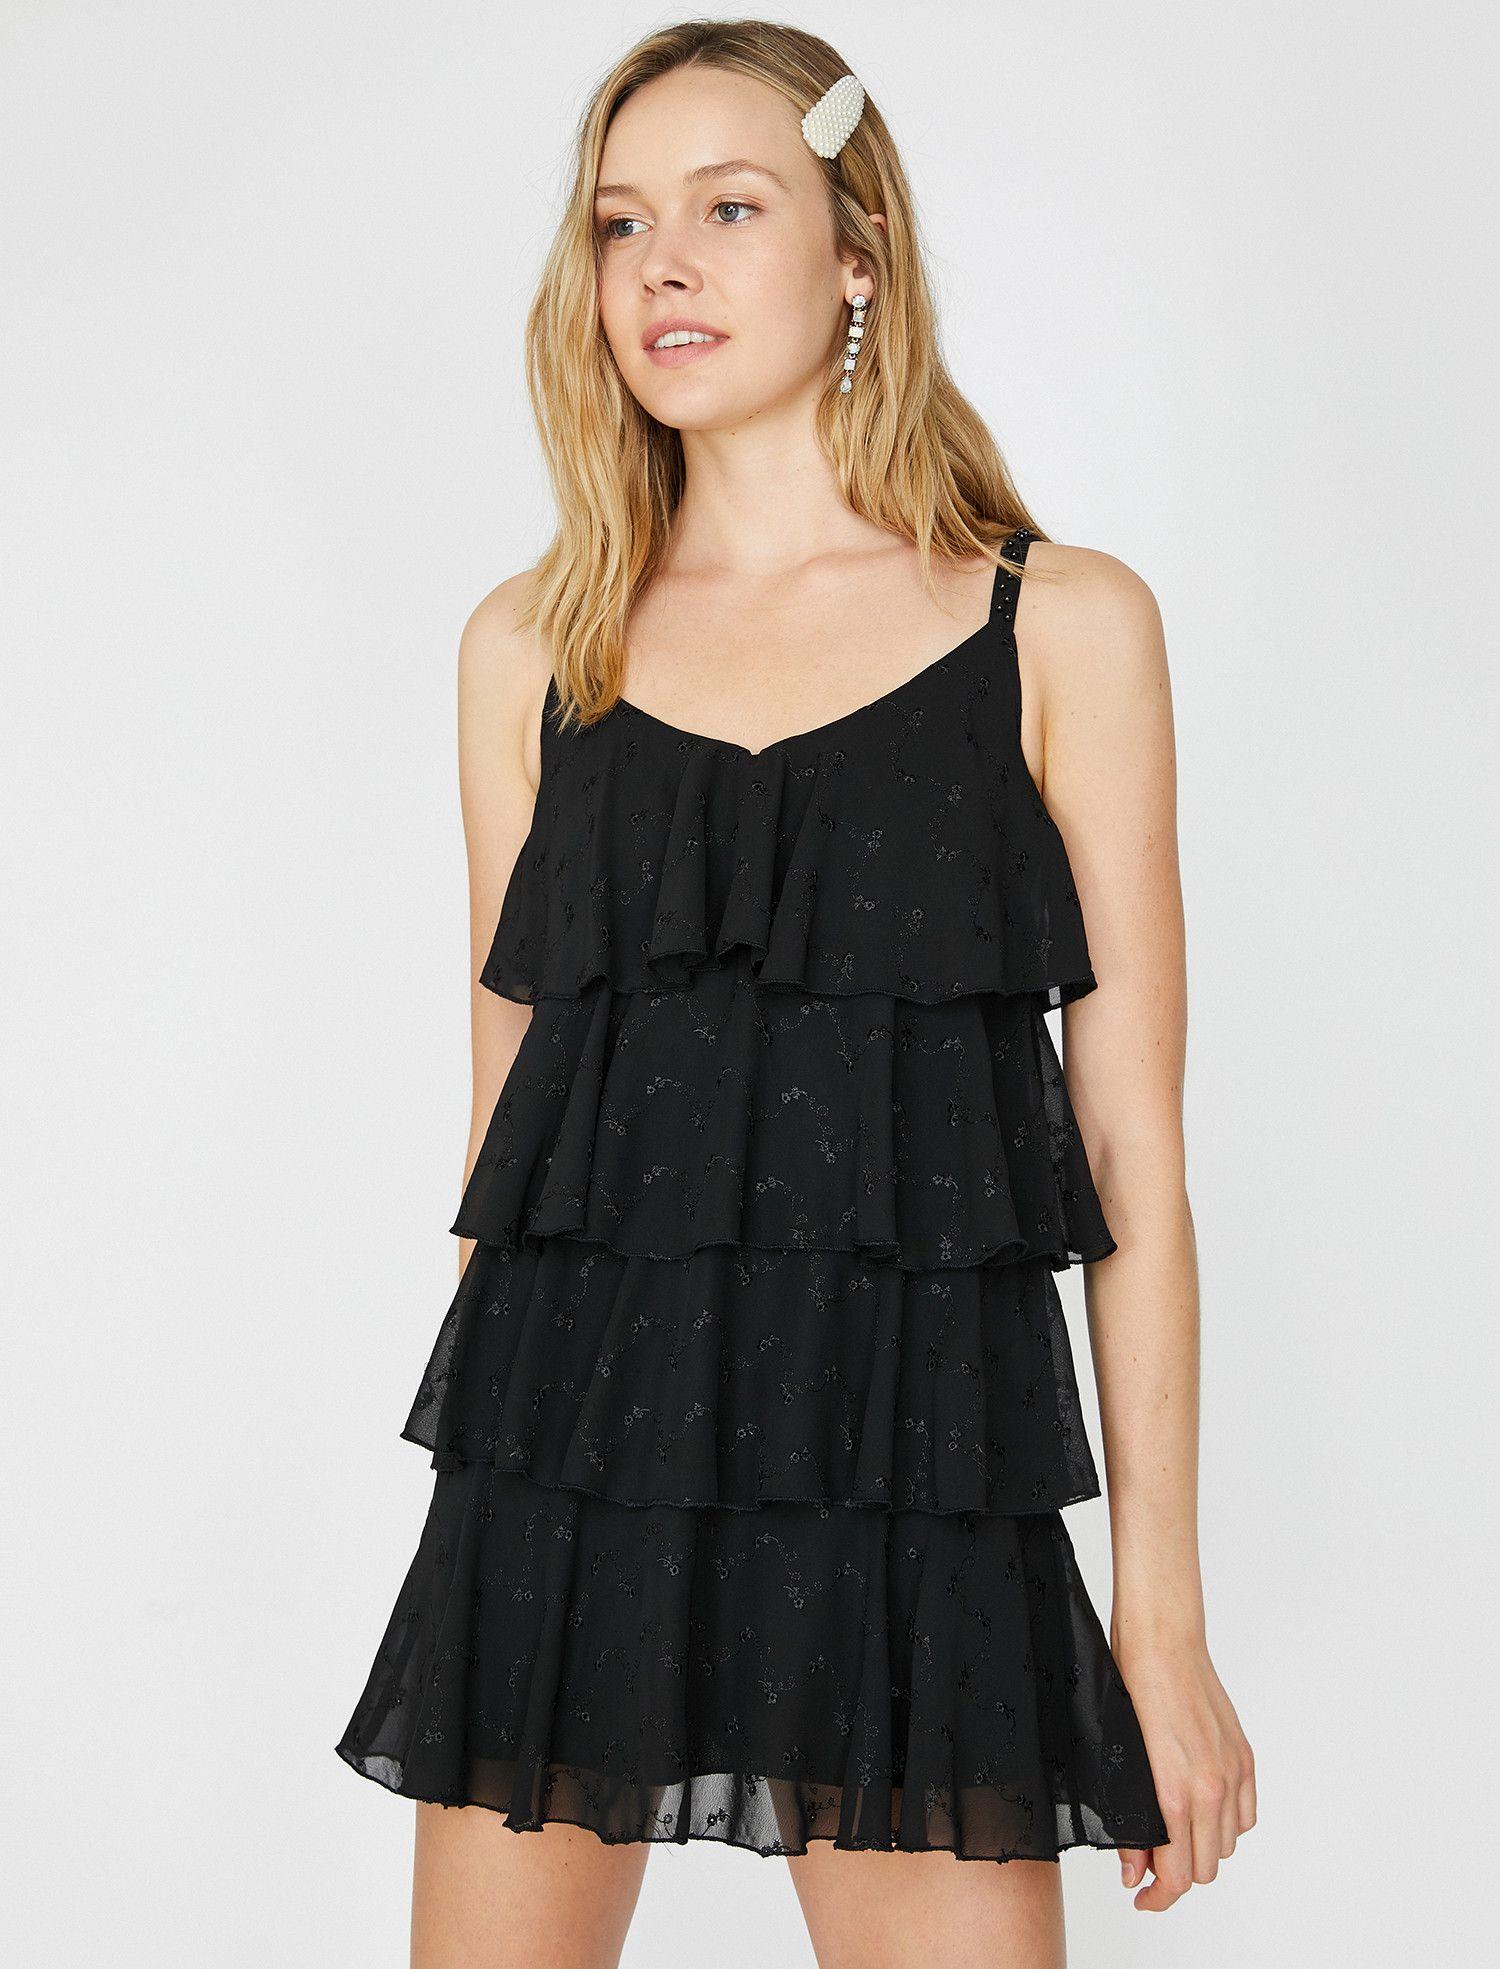 Koton Koton Kadin Firfir Detayli Elbise Mini Elbise Elbise Siyah Elbise